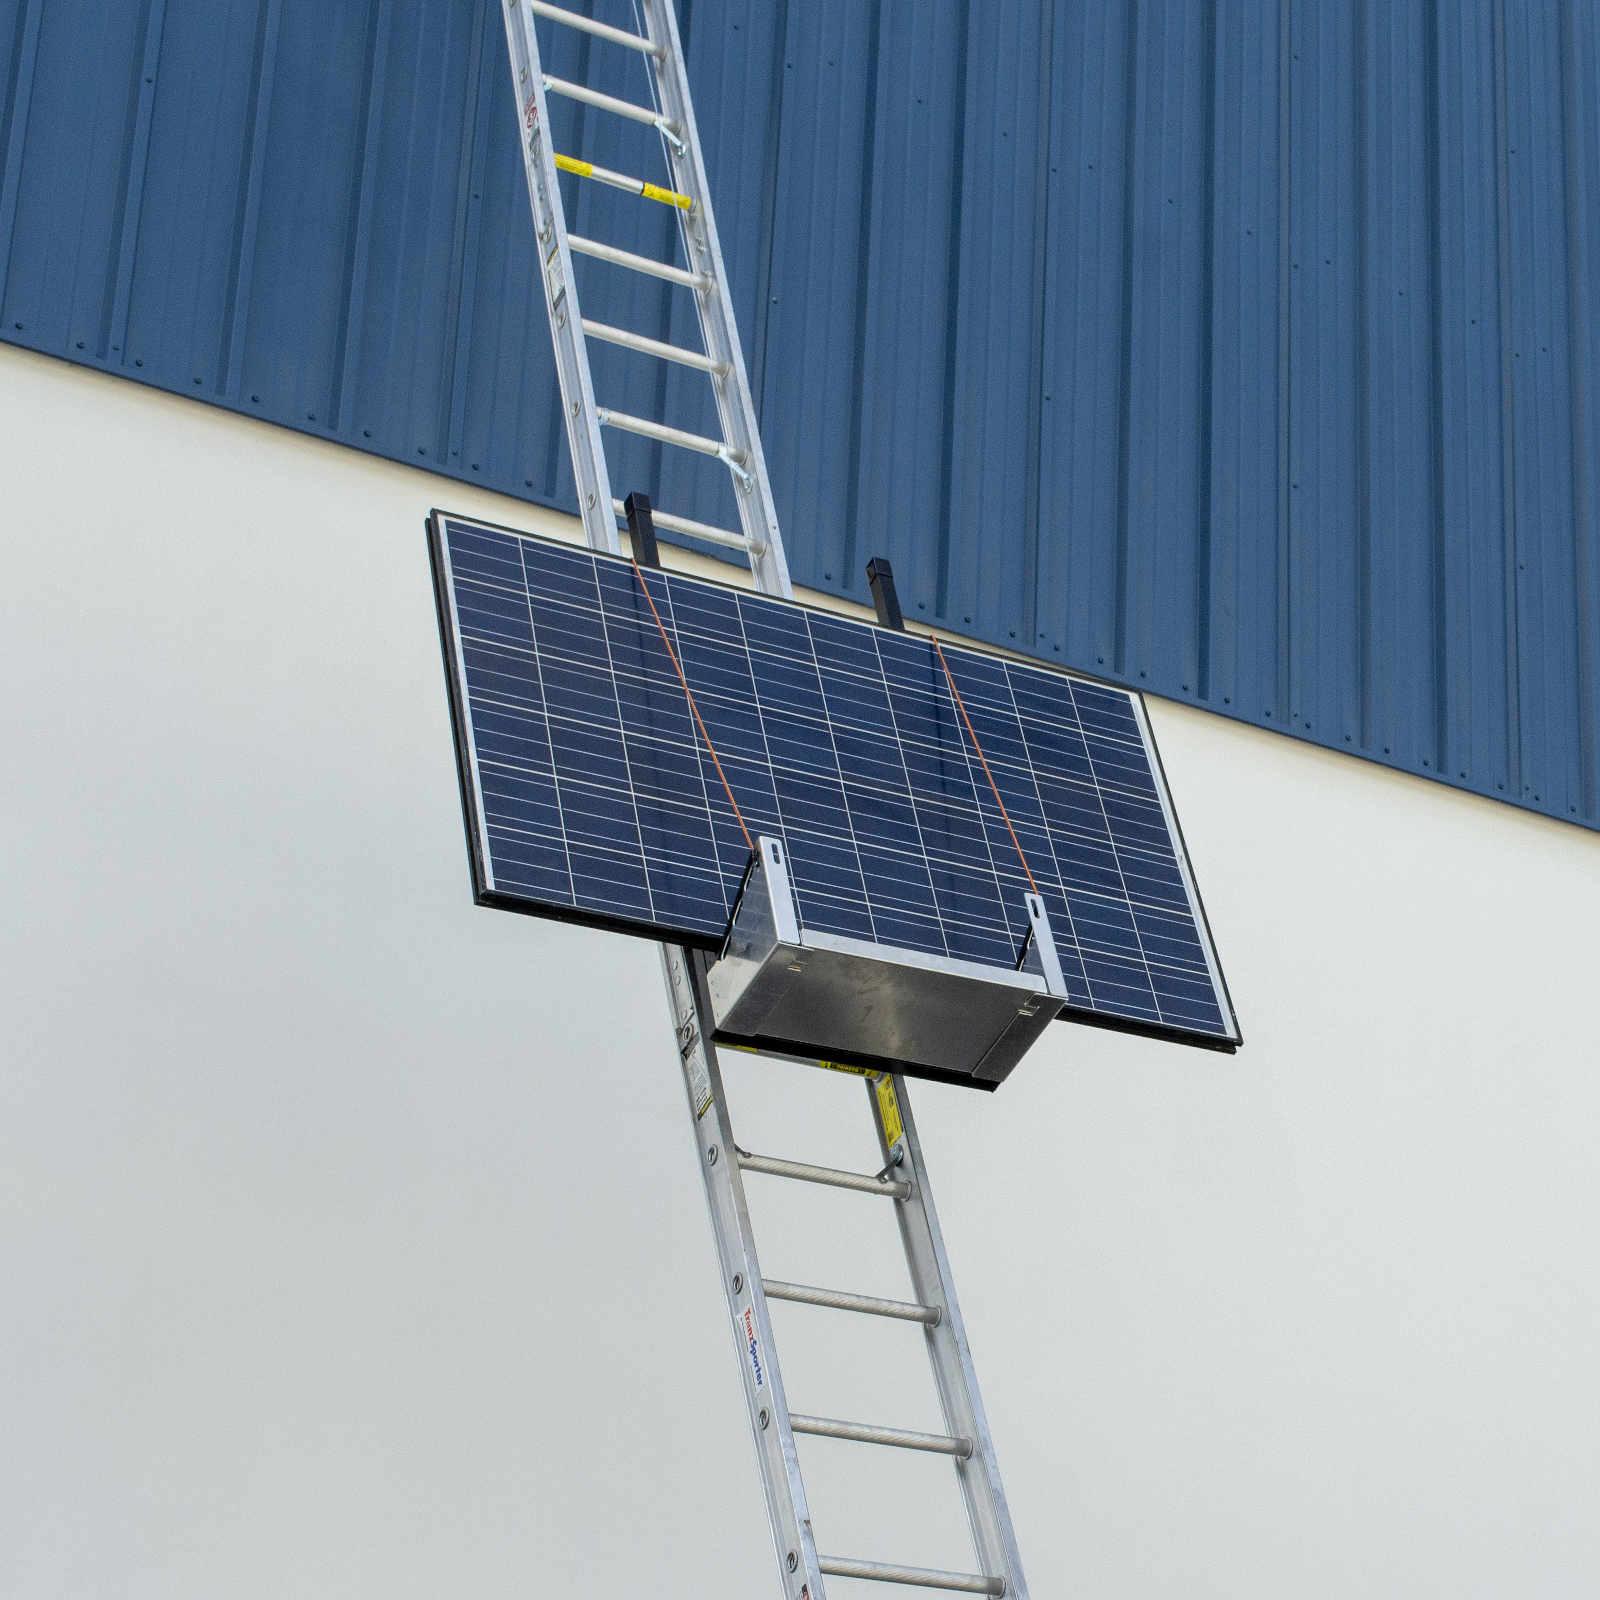 Solar Panel Raised